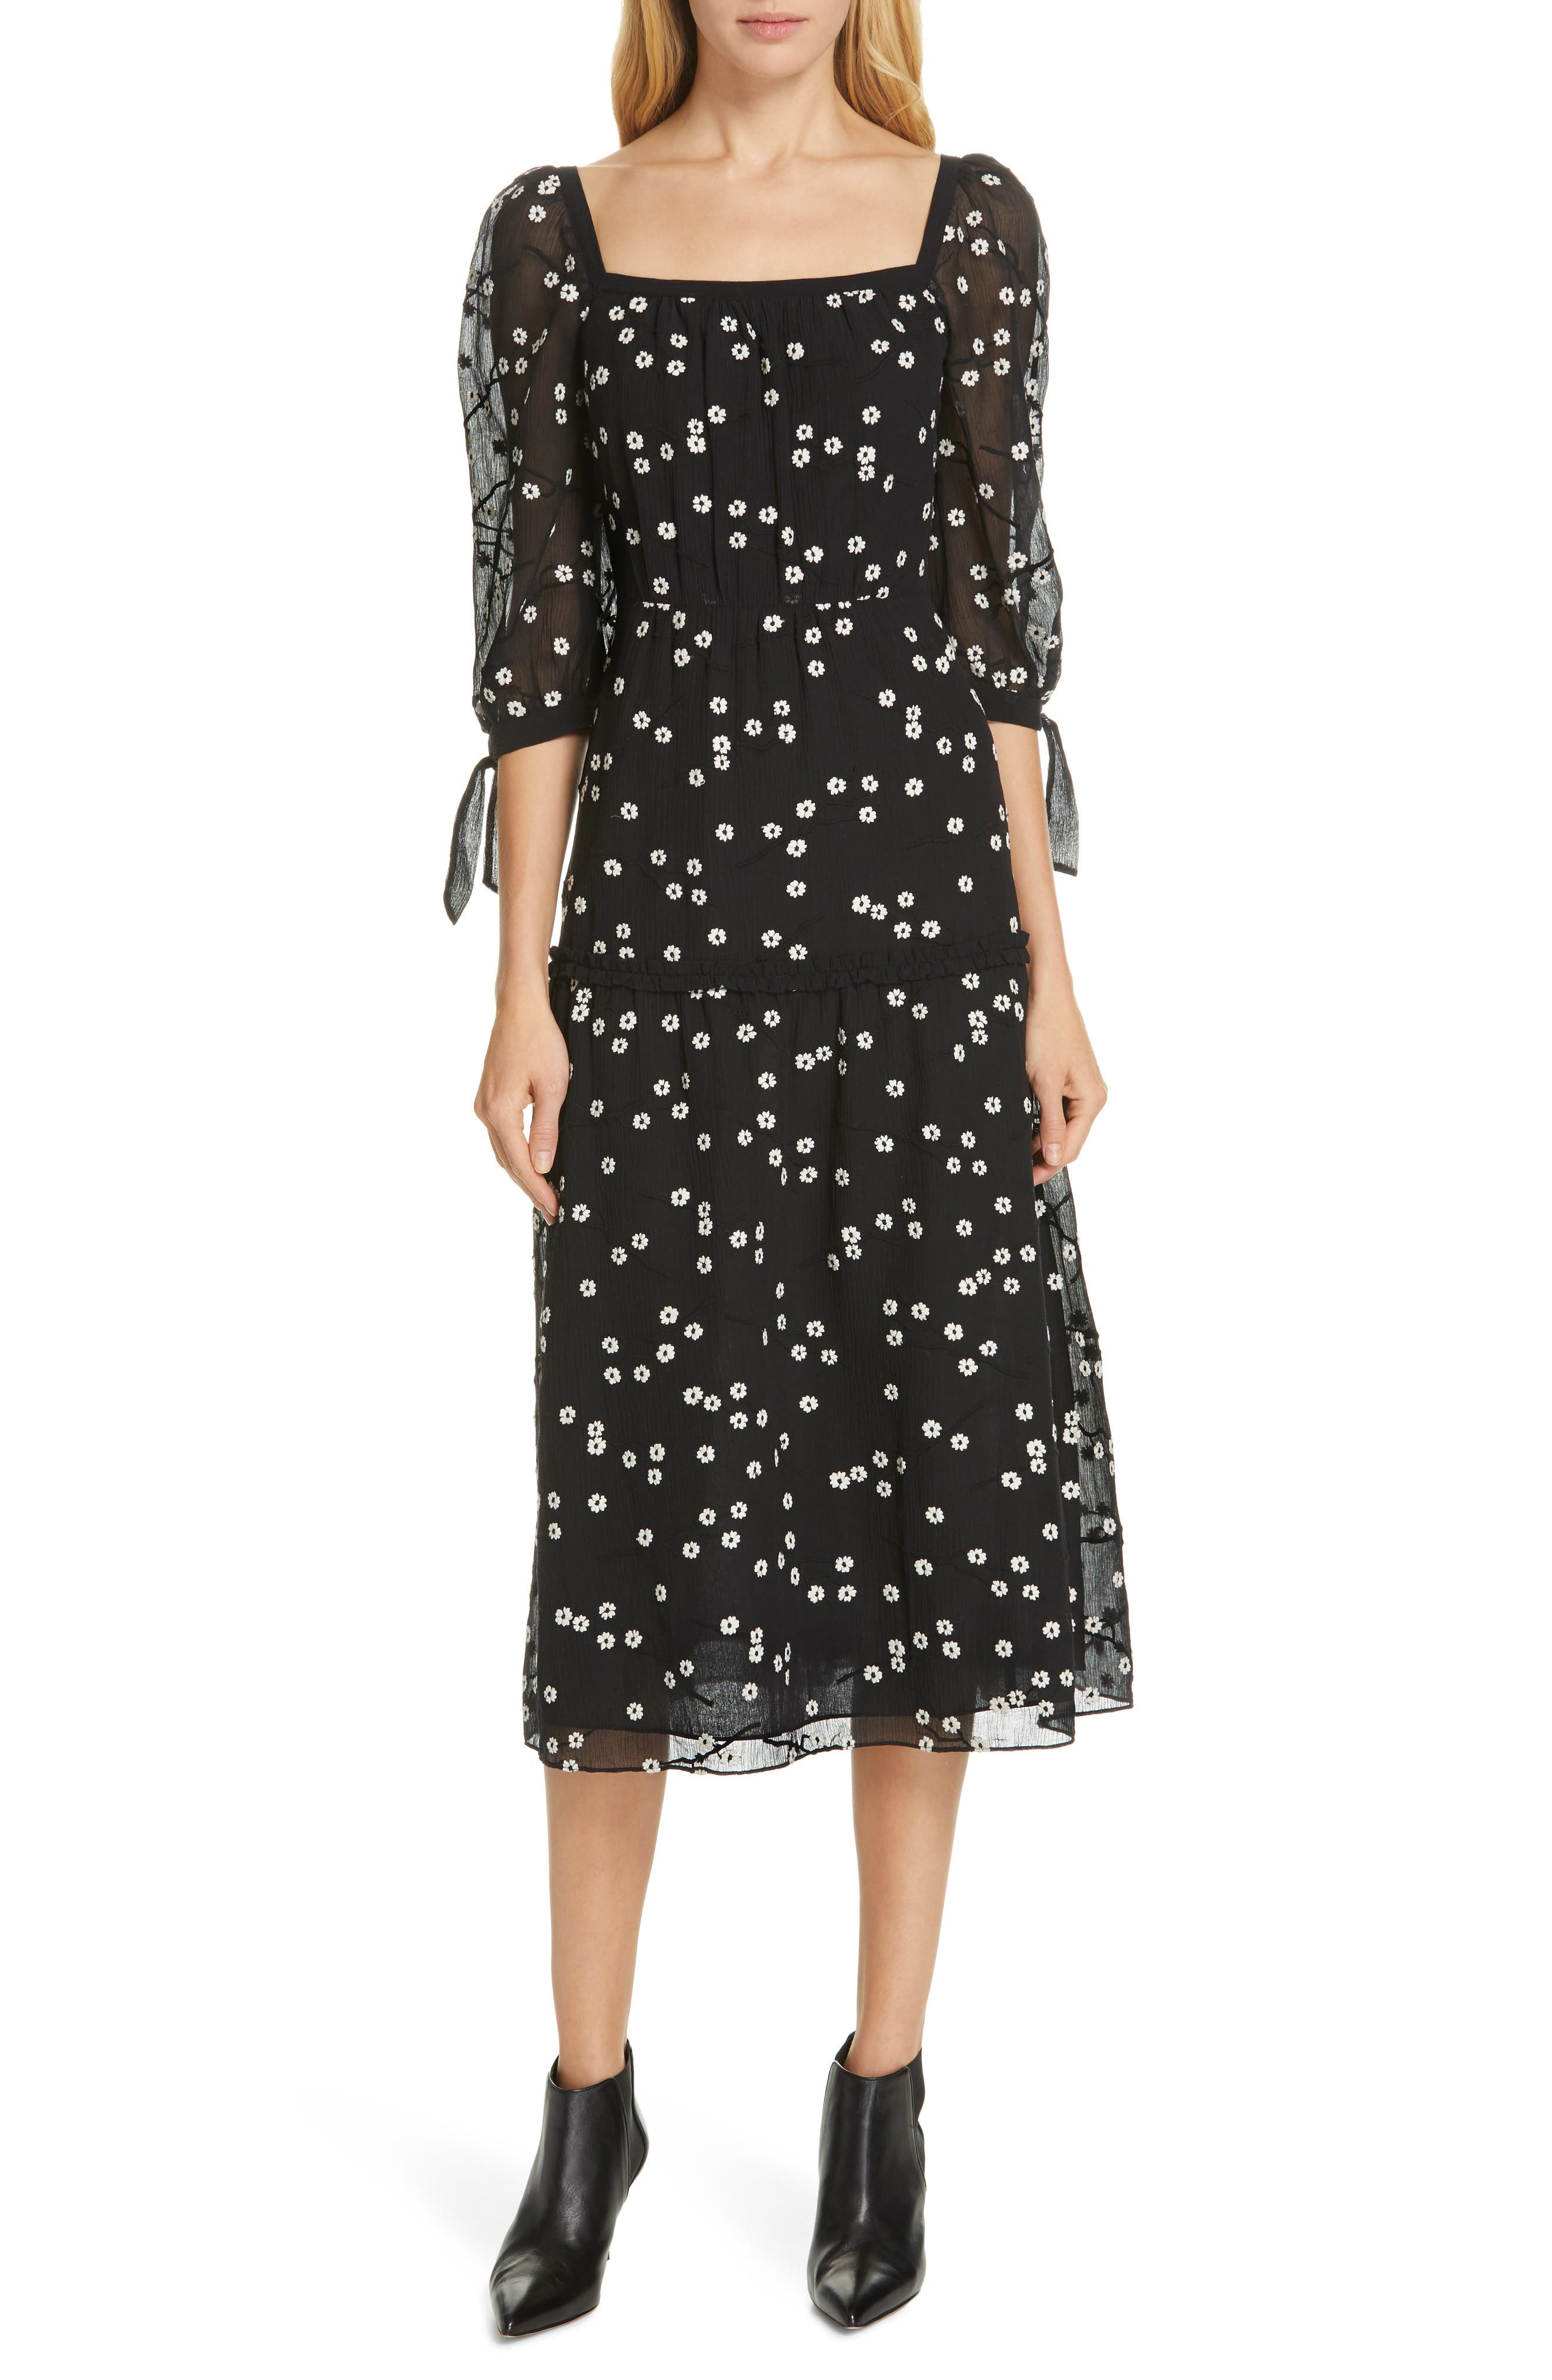 REBECCA TAYLOR, Allessandra Midi Dress, Main thumbnail 1, color, BLACK COMBO